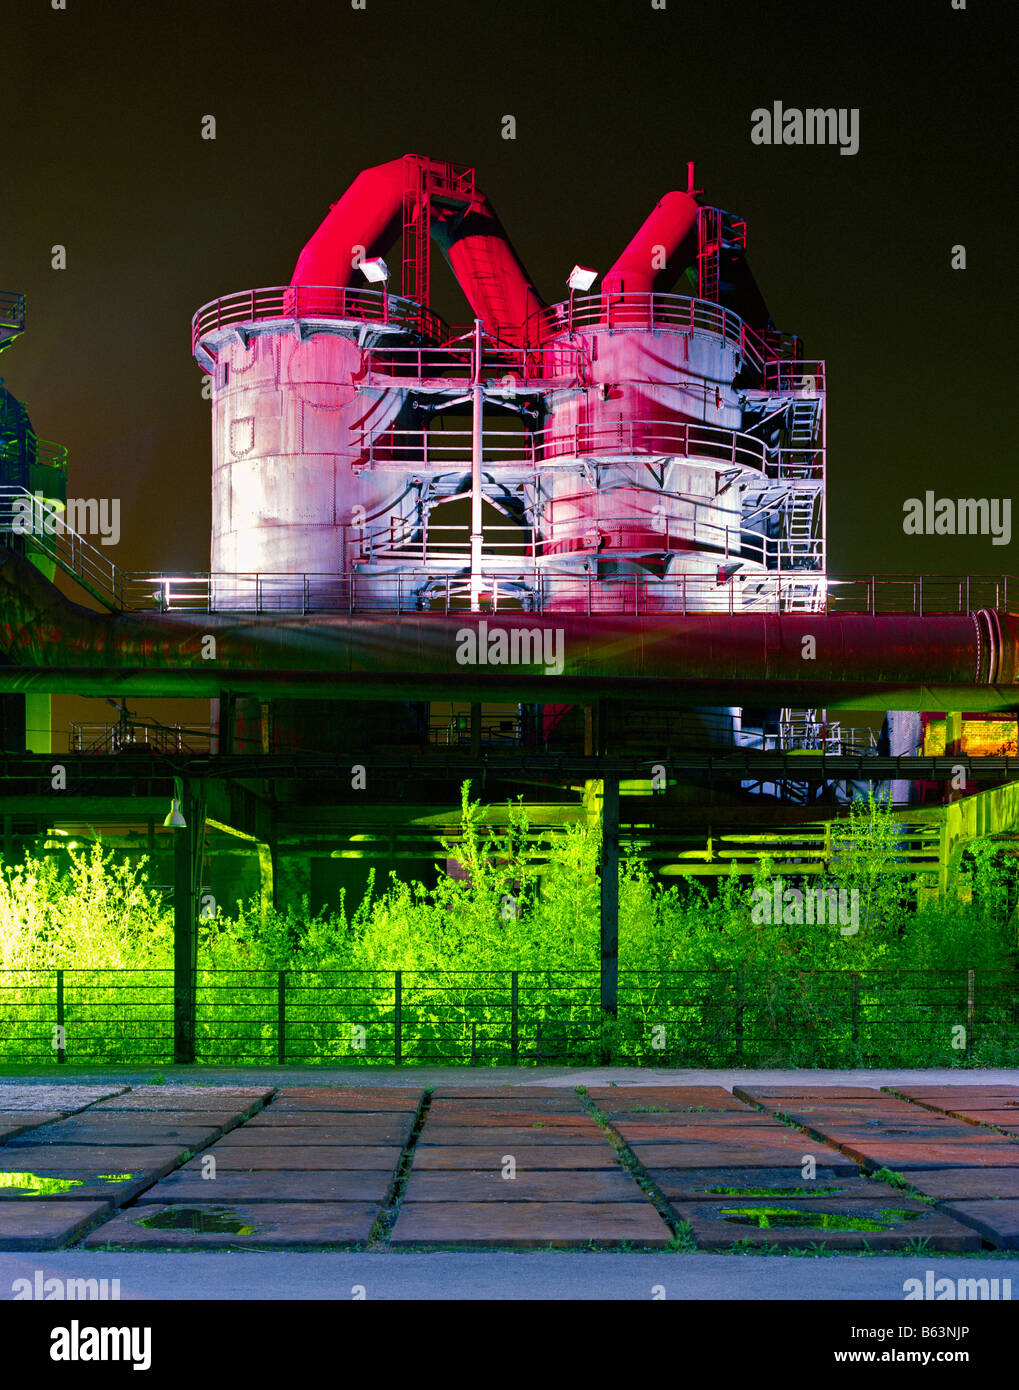 disused steelworks at night Piazza Metallica in the Landschaftspark Duisburg-Nord Meiderich Stahlwerk bei Nacht - Stock Image